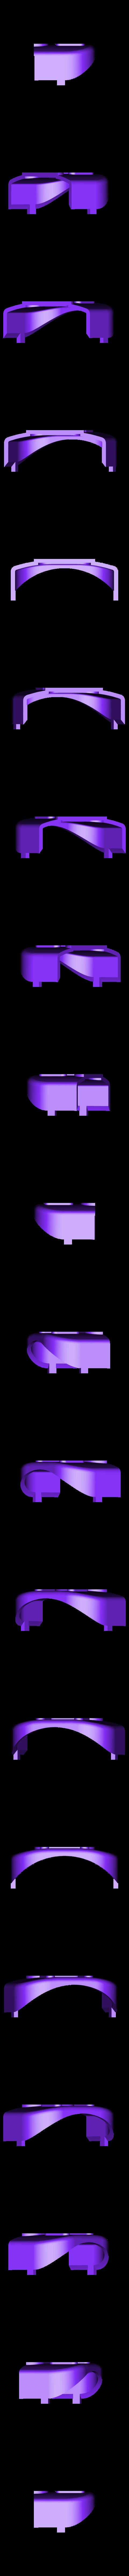 Sandbox_Front-Part_1_-_SCALED-A.STL Download free STL file 4-8-8-4 Big Boy Locomotive • 3D printer object, RaymondDeLuca